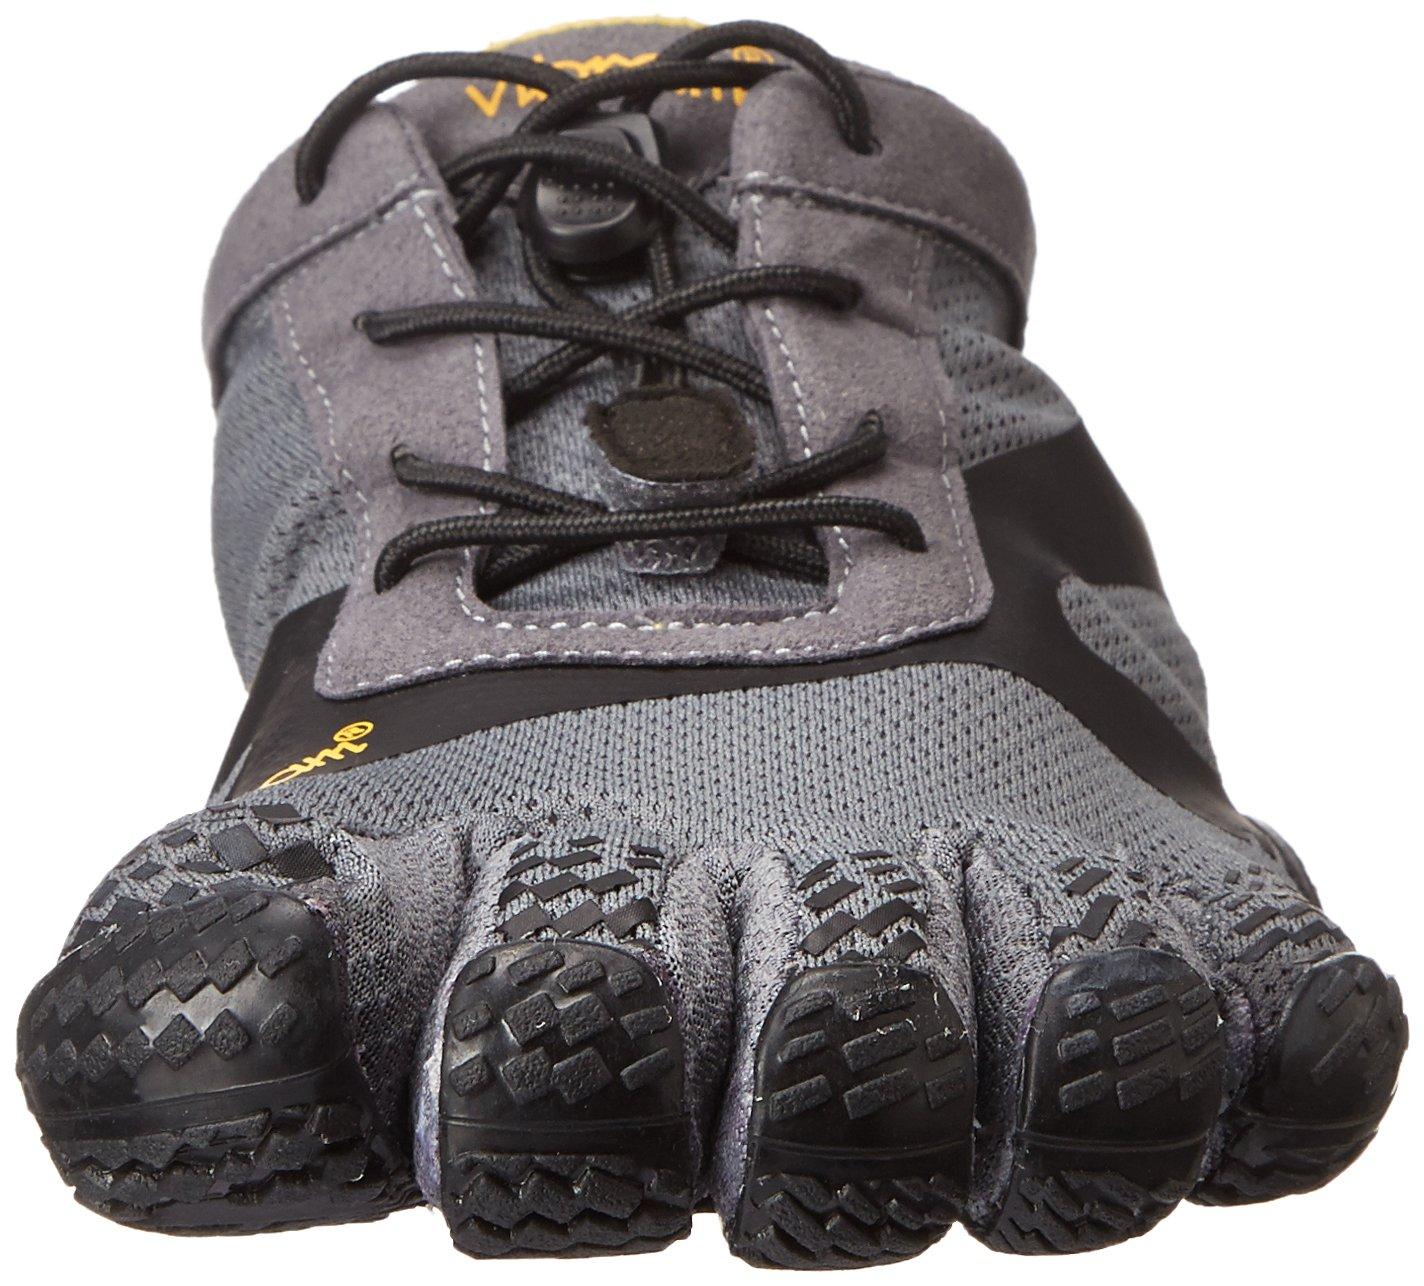 Vibram Men's KSO EVO Cross Training Shoe,Grey/Black,41 EU/8.5-9.0 M US by Vibram (Image #4)